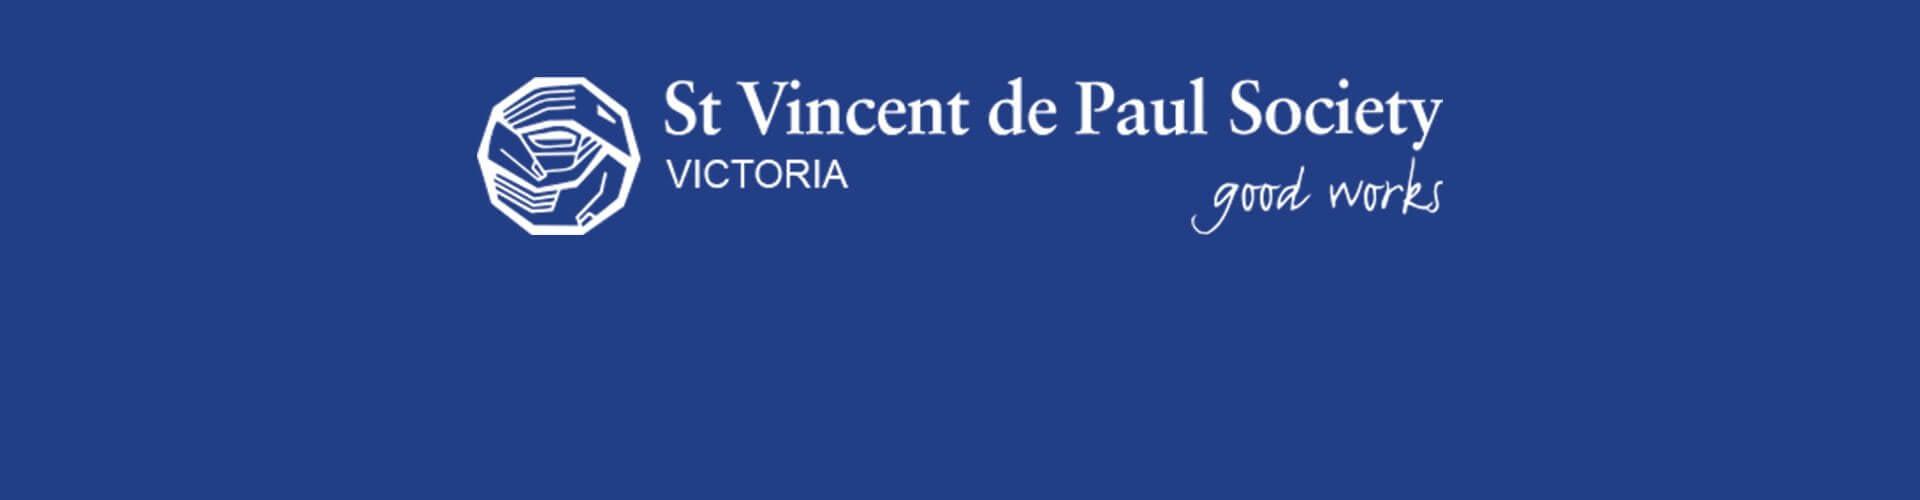 St-Vincent-Depaul-Society